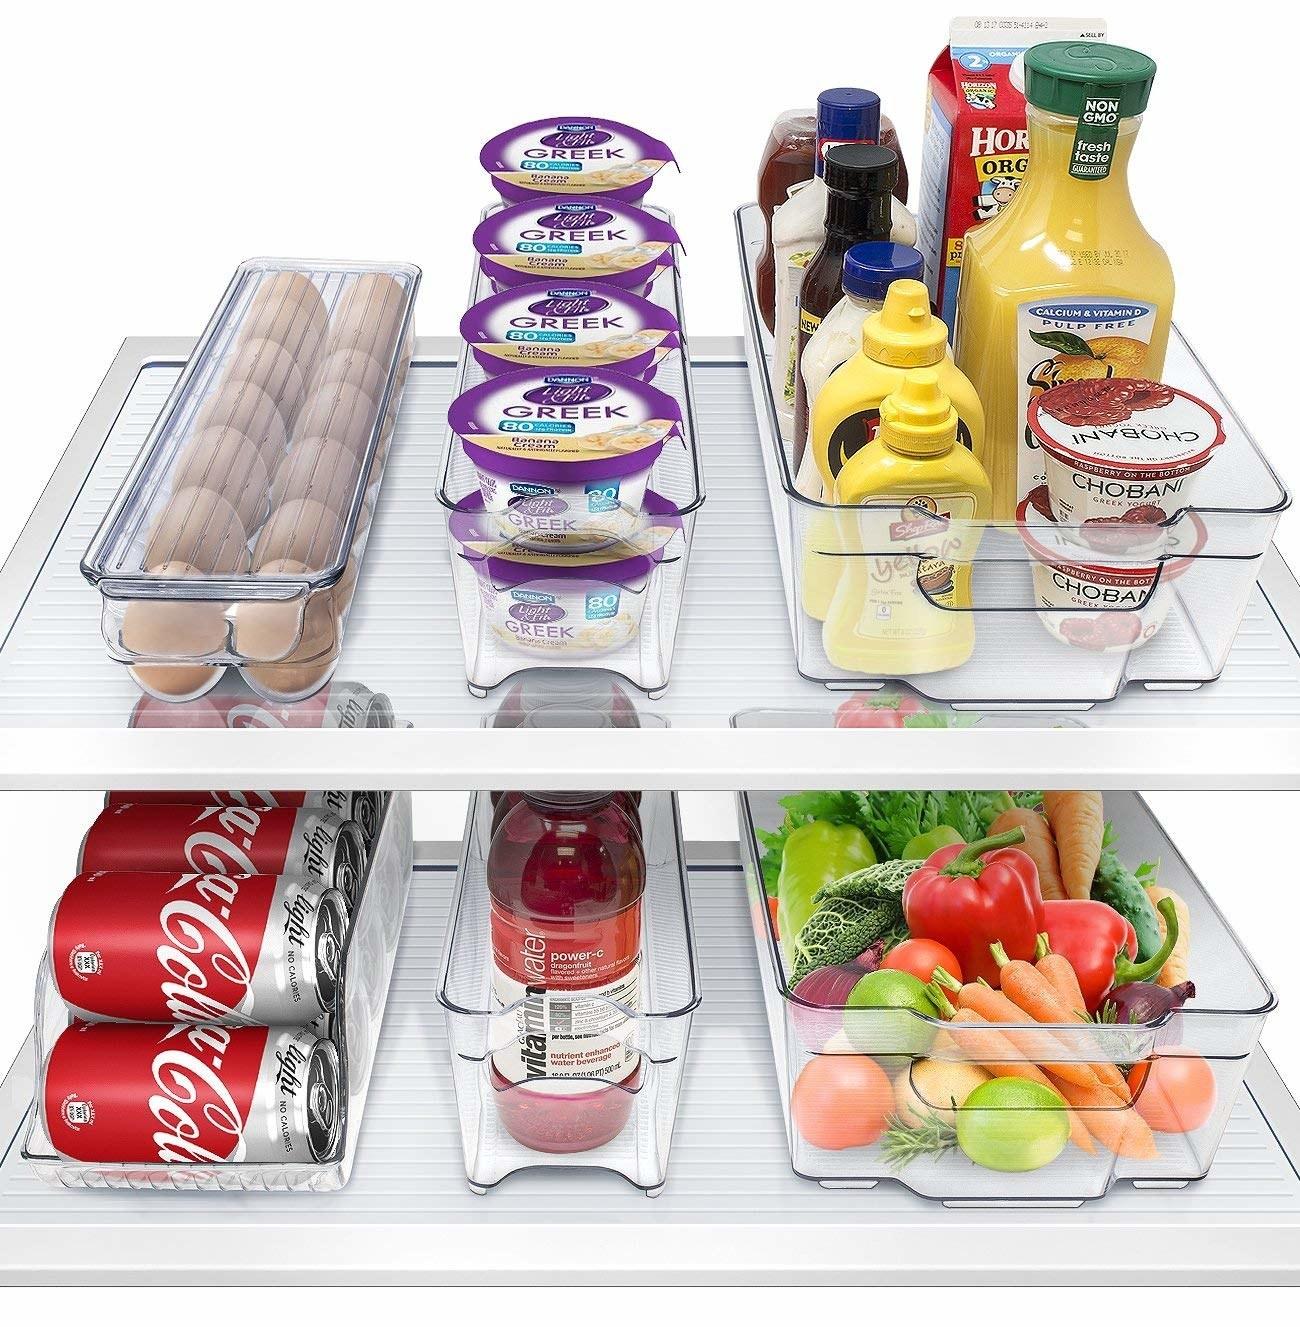 Clear bins containing food inside fridge